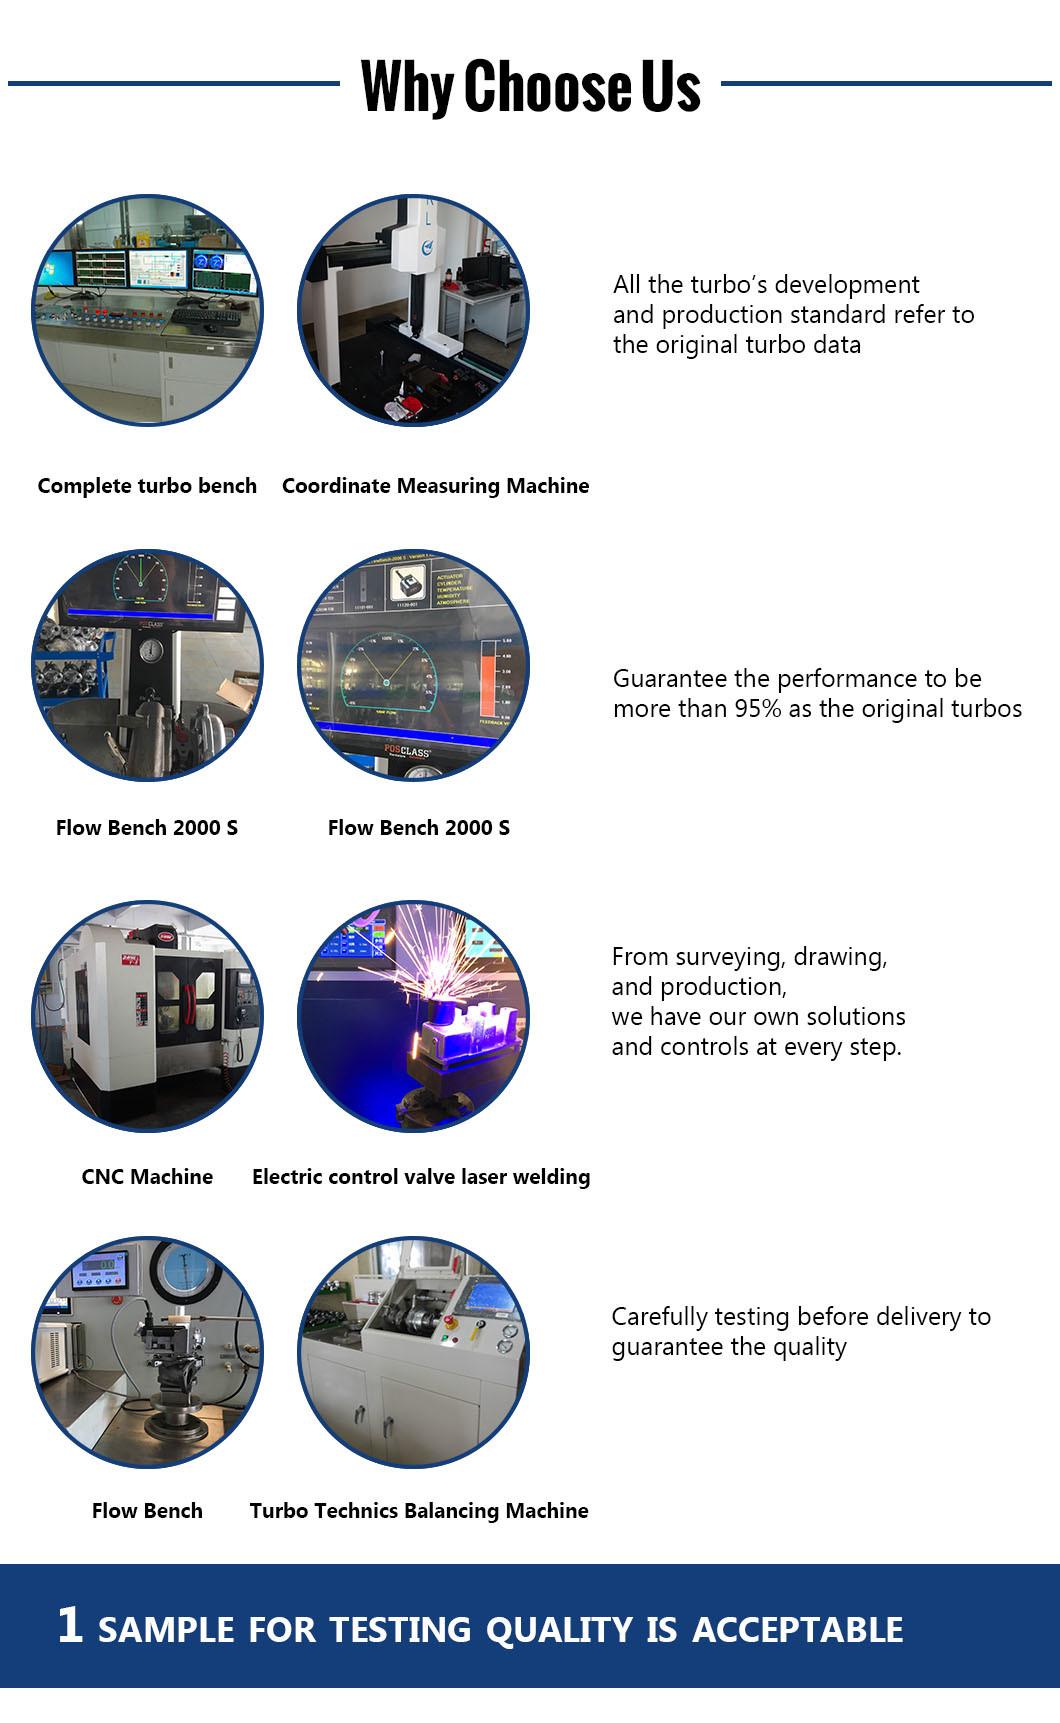 Turbocharger 4D56 Mitsubishi TF035hl2-12gk2-Vg 49135-02652 49s35-02652 4913502652 49s3502652 Mr968080